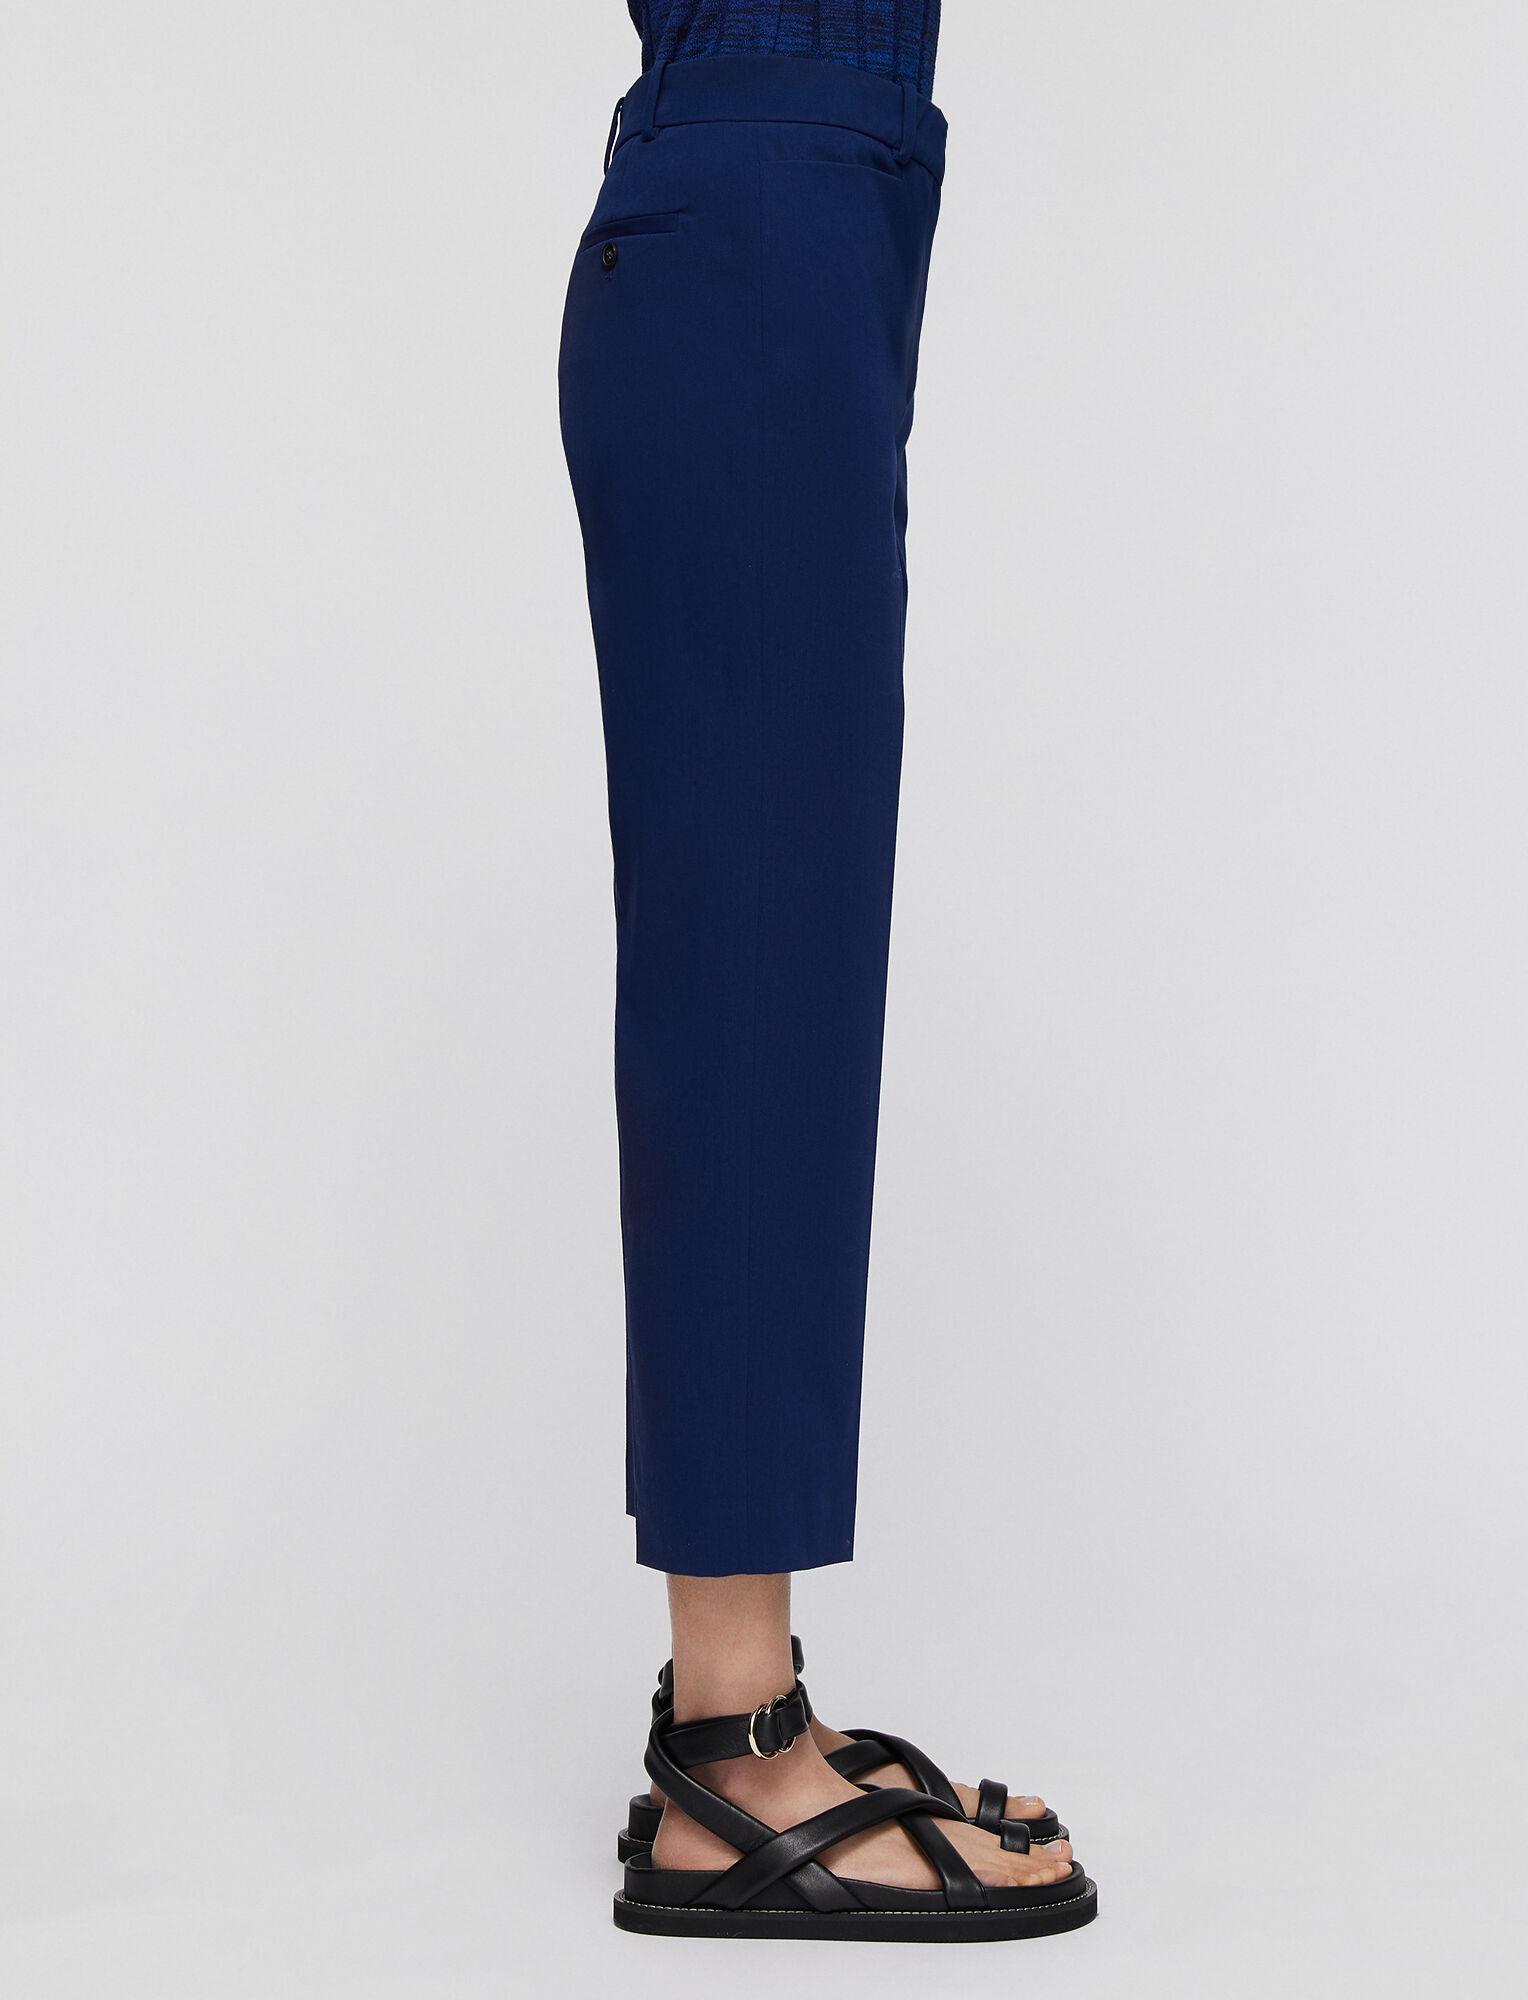 Joseph, Pantalon Sloe en coton stretch, in COBALT BLUE